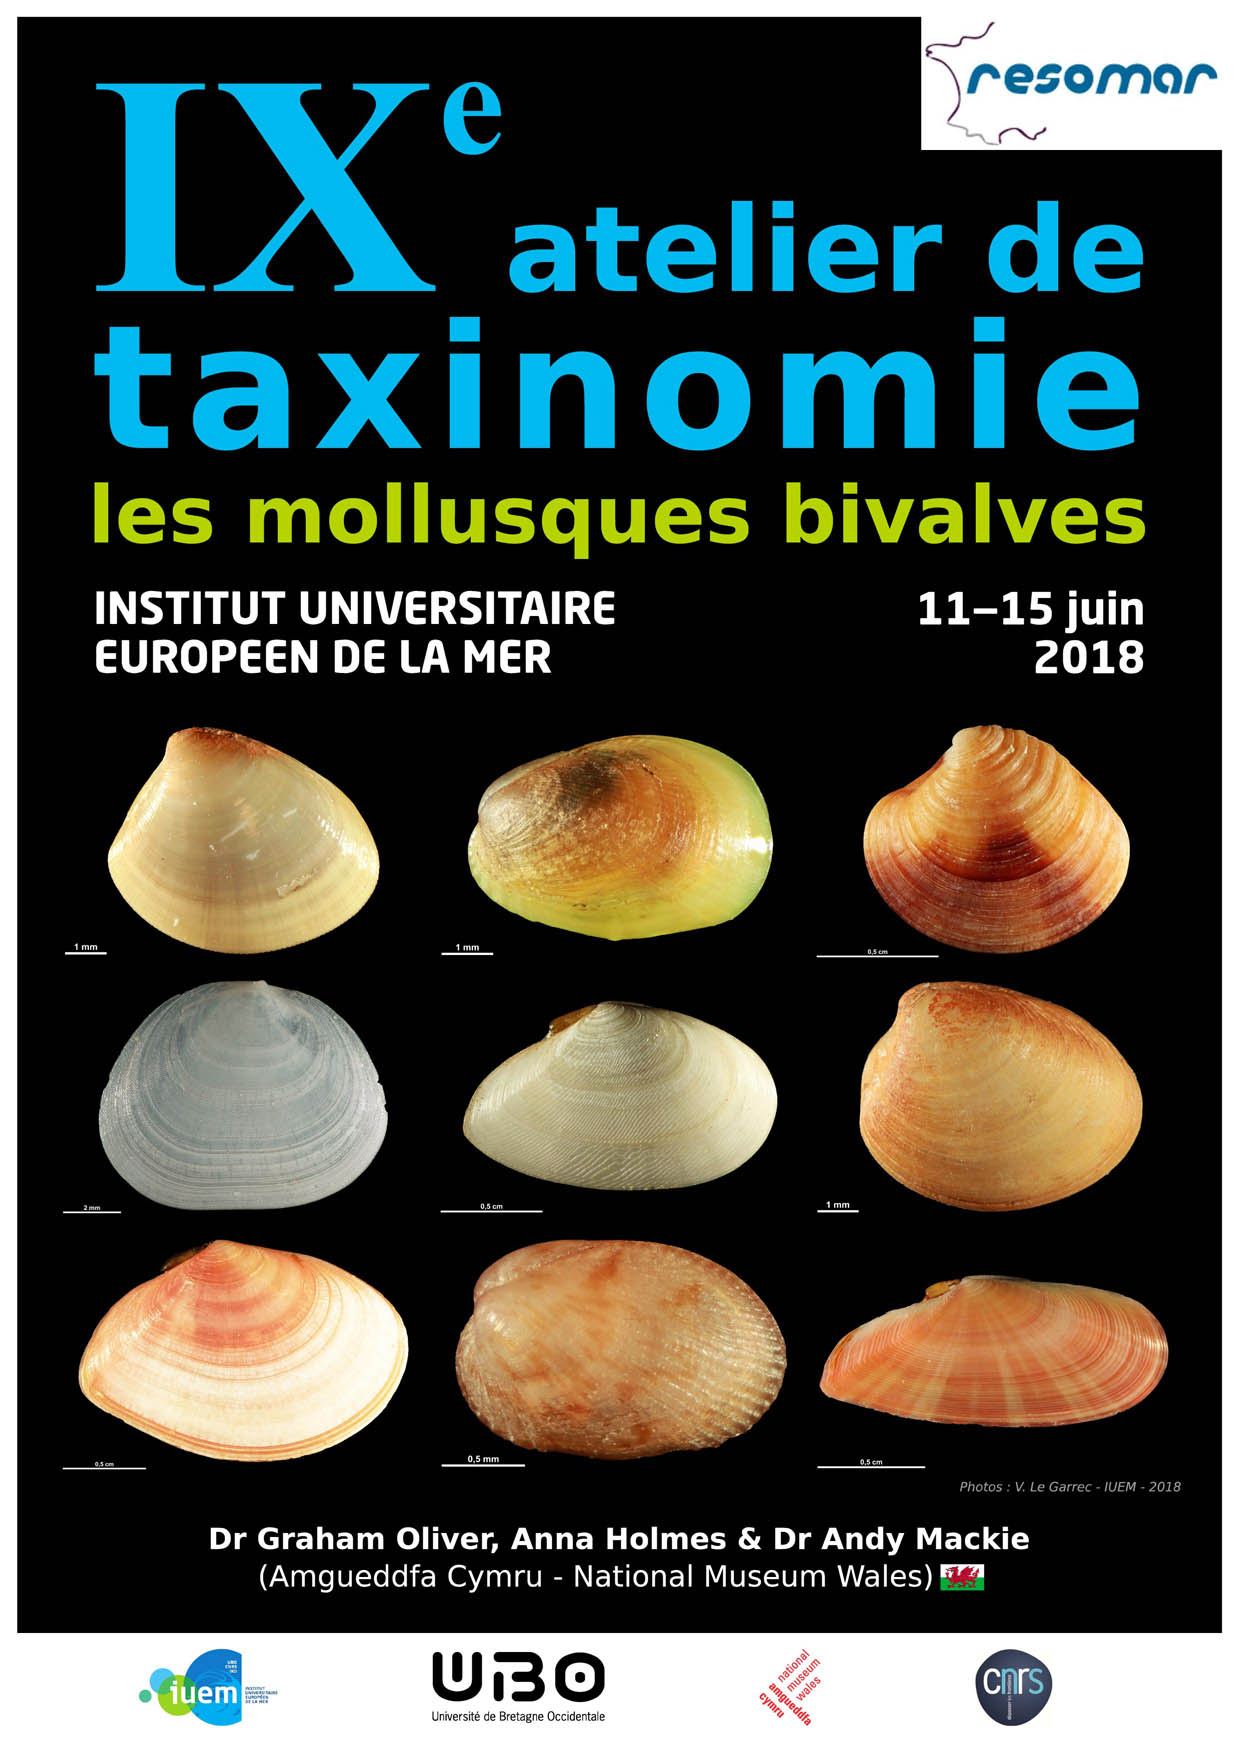 Affiche atelier taxinomique RESOMAR 2018